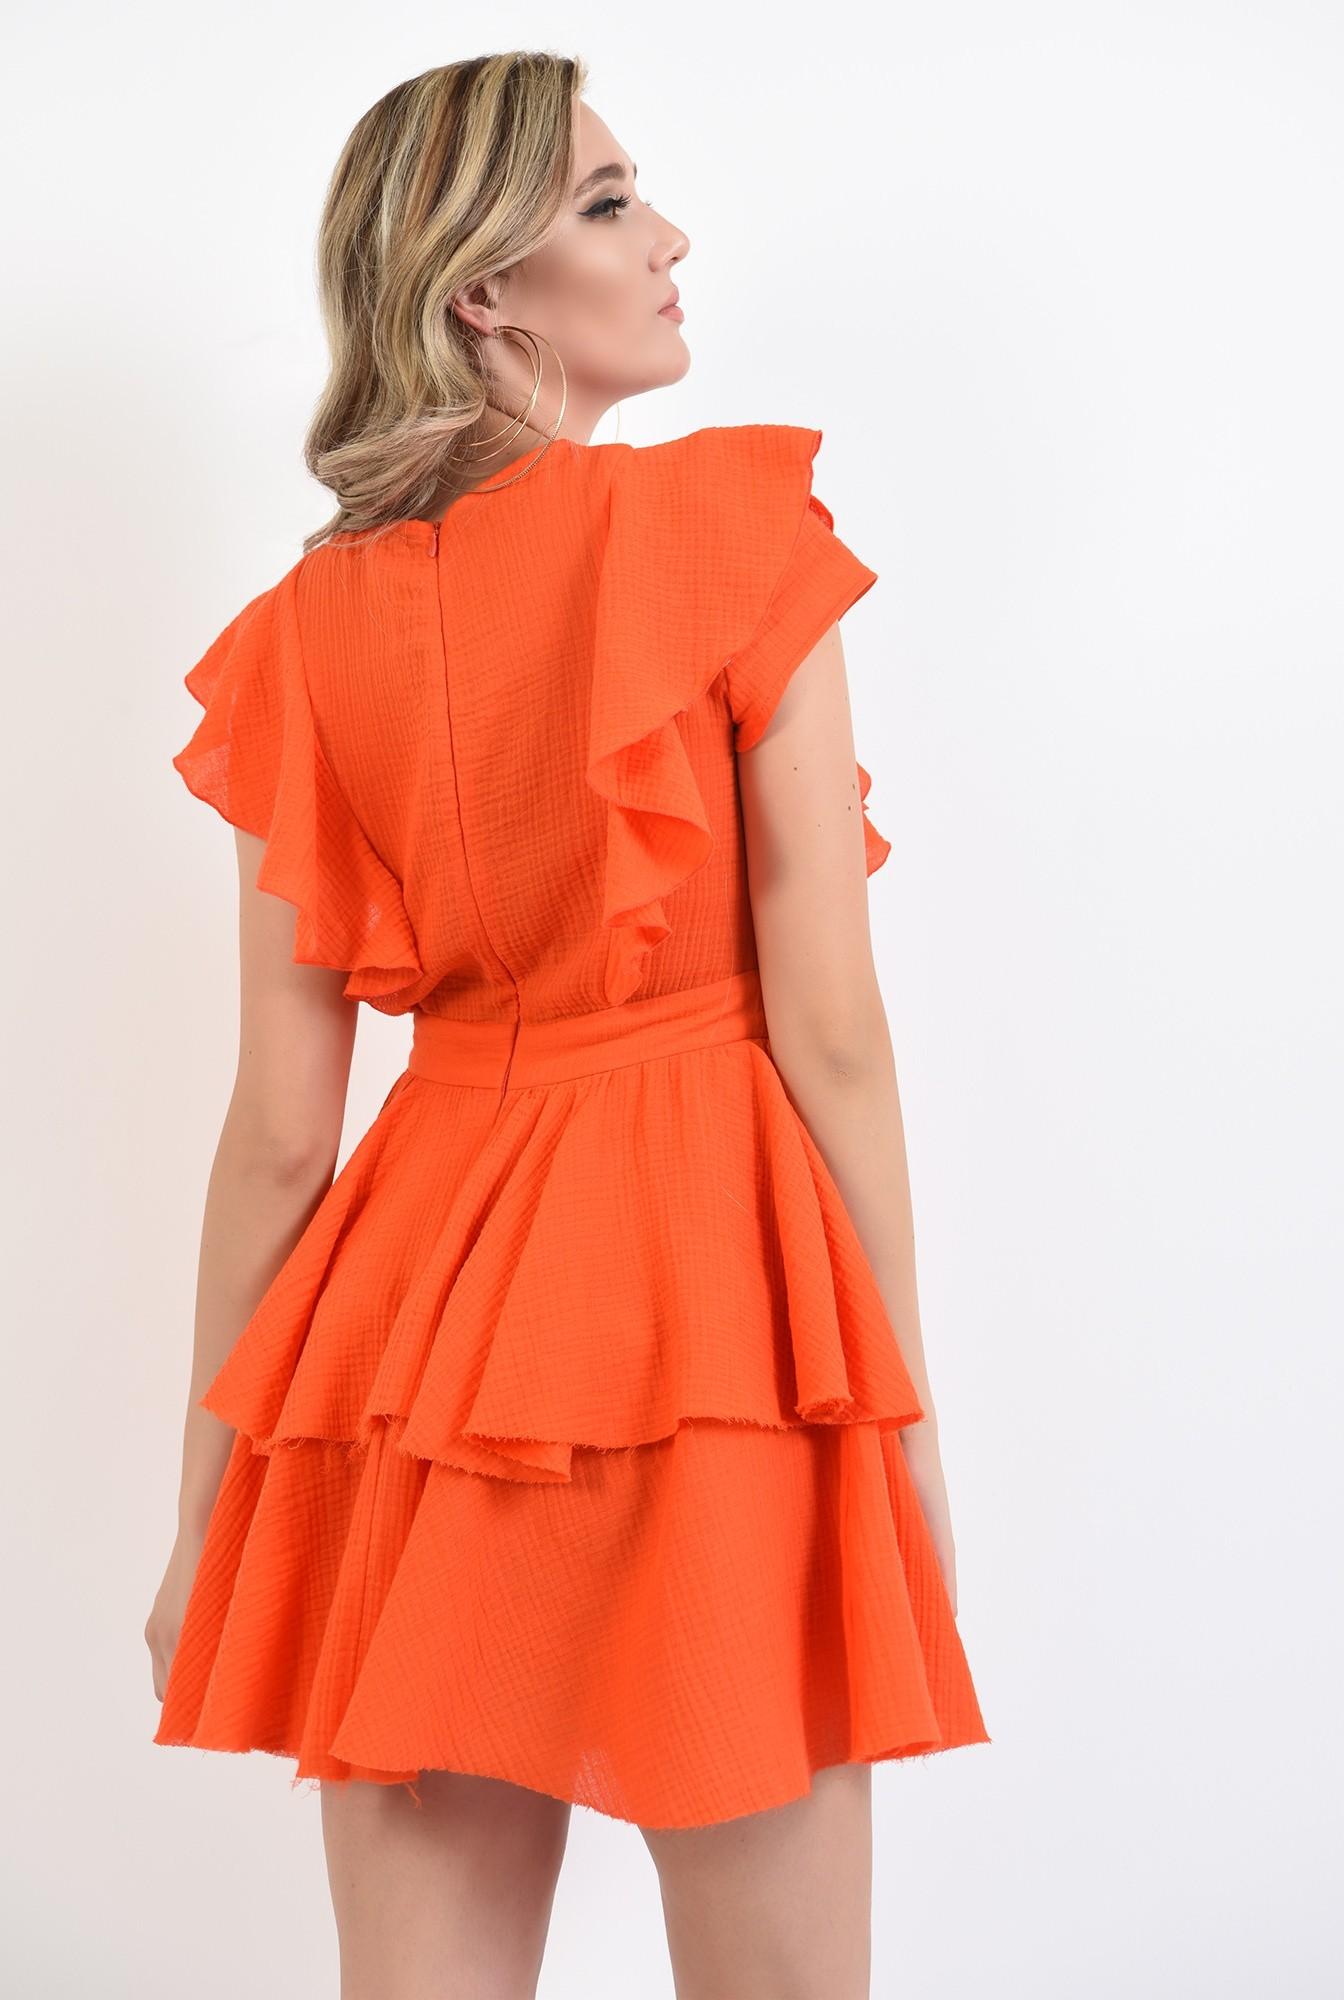 2 - 360 - rochie mini, orange, cu volane, Poema